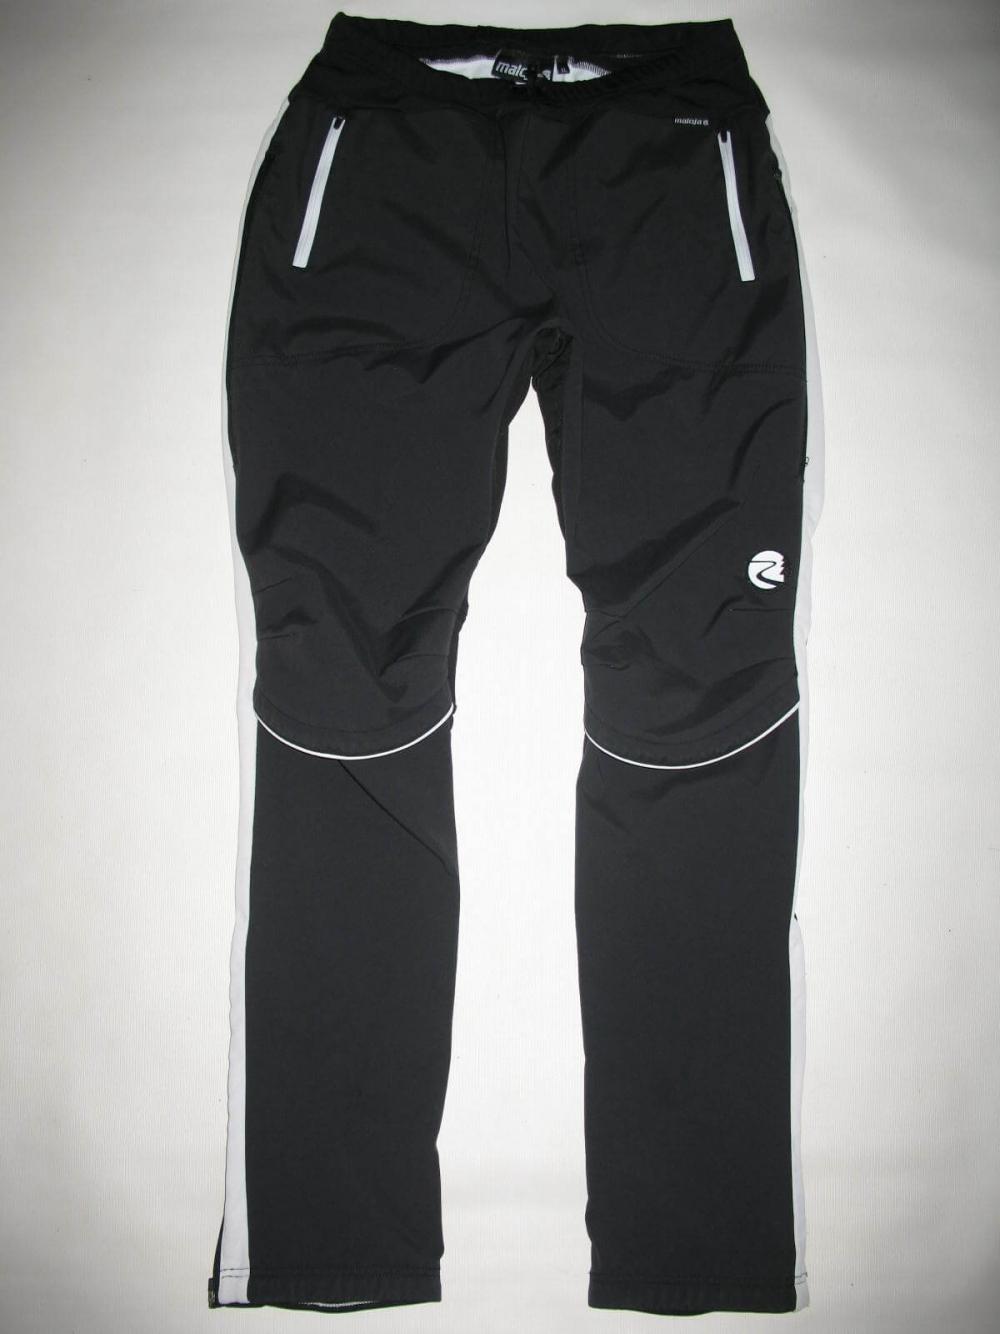 Велобрюки MALOJA sacha softshell pants (размер XL) - 1